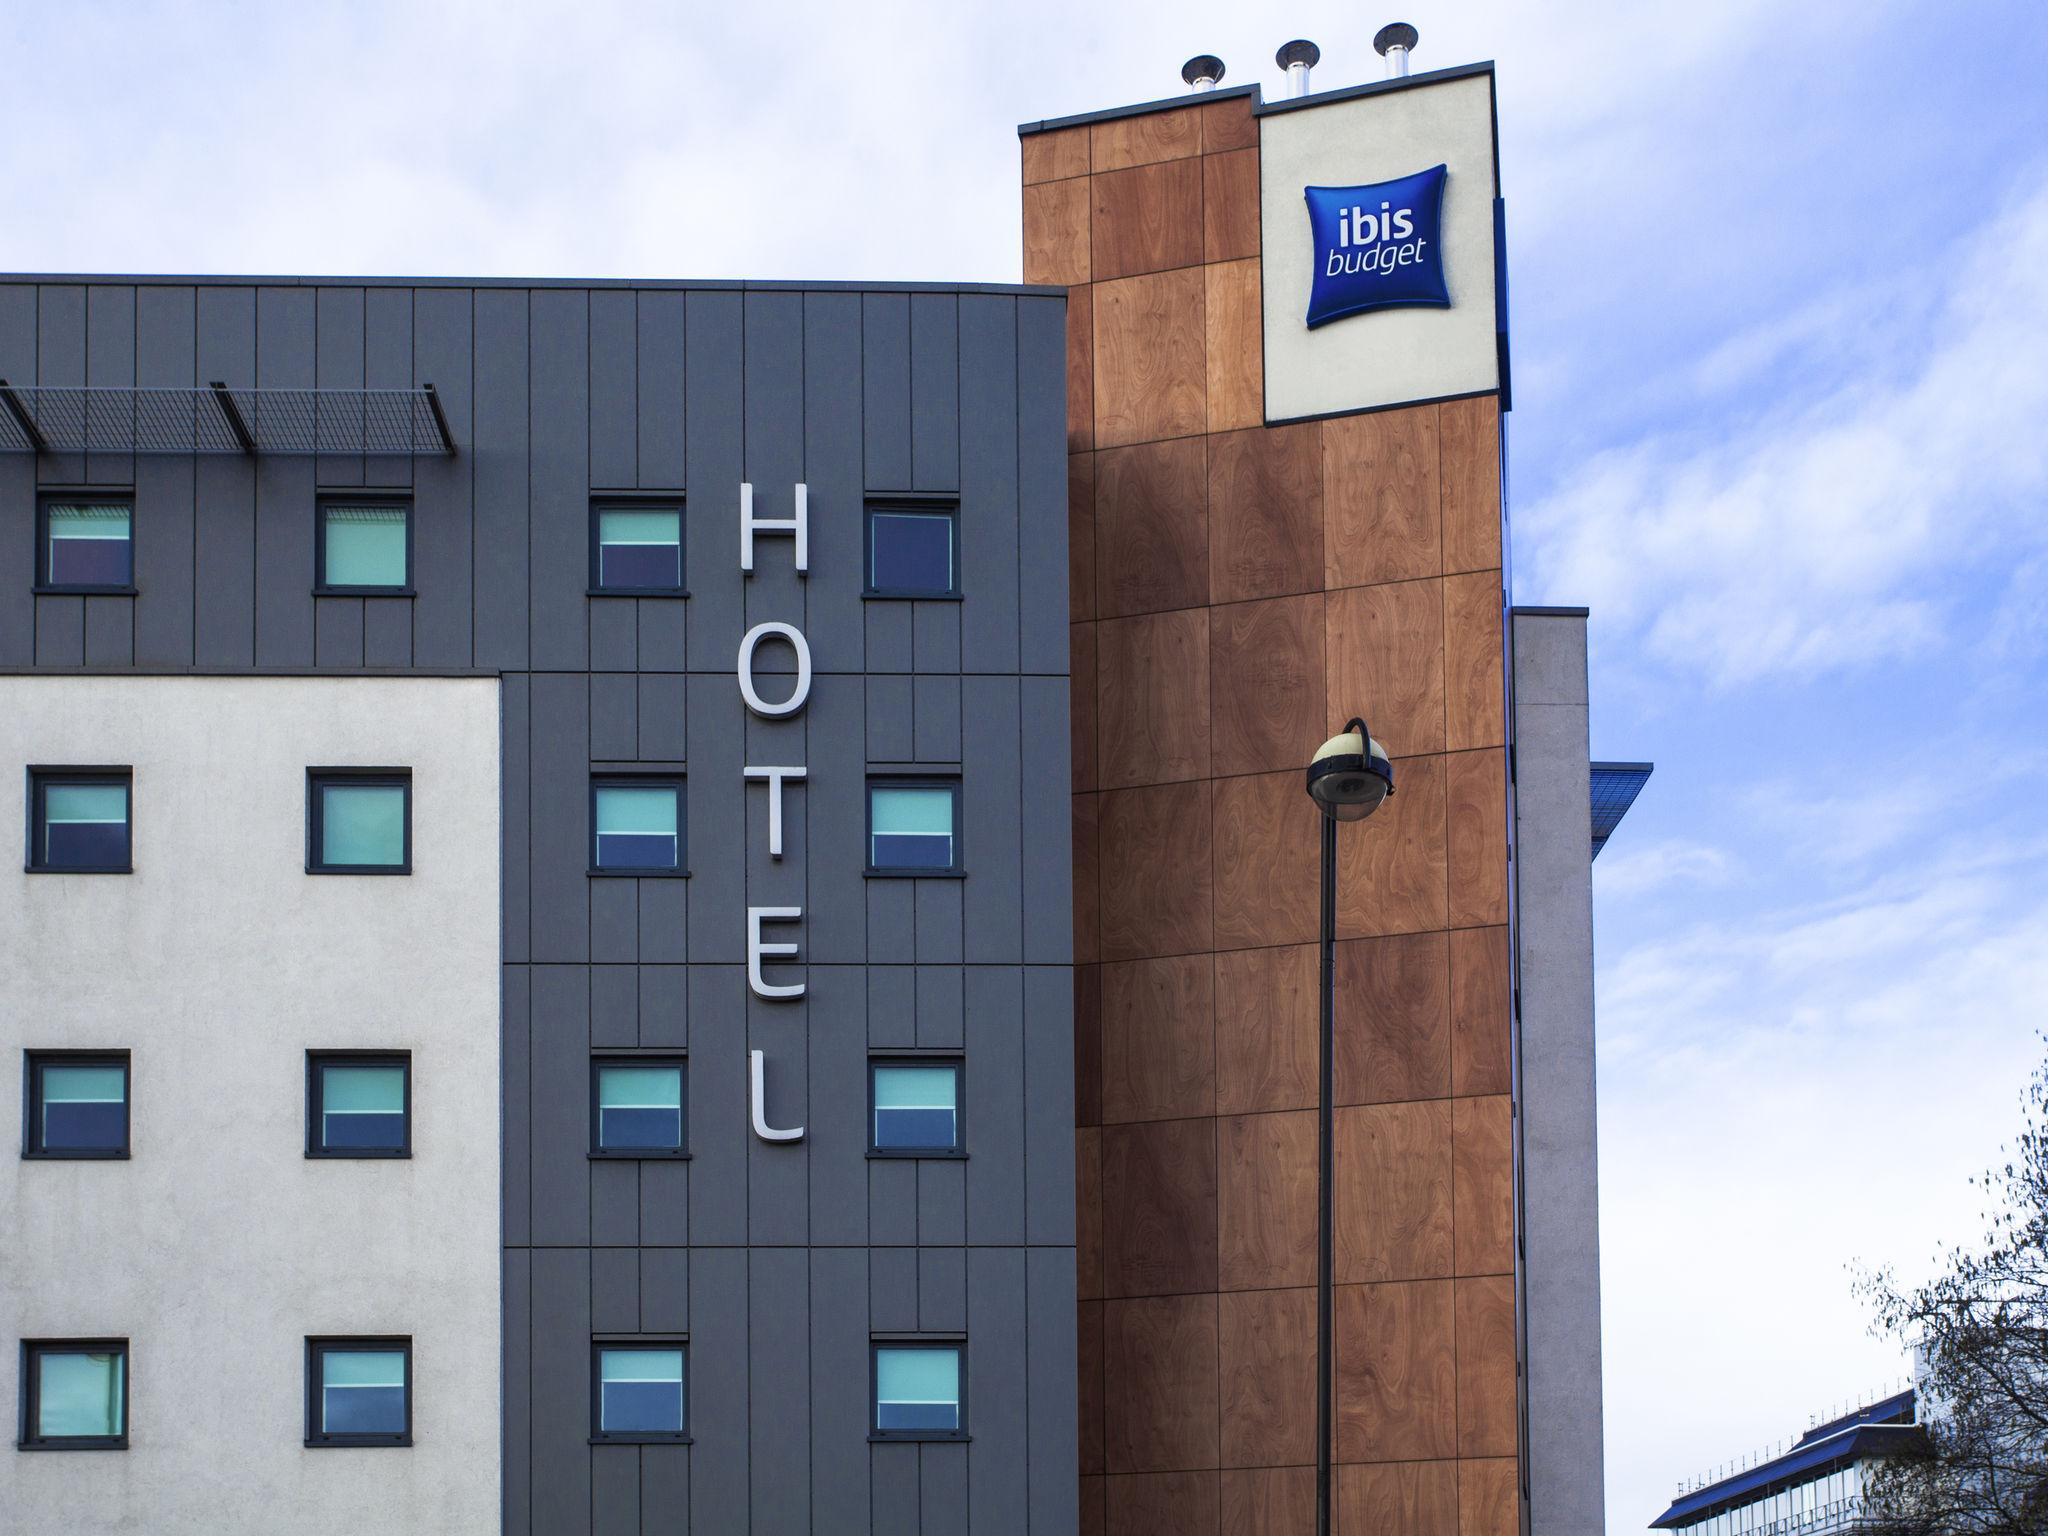 Hotel – ibis budget Londra Hounslow